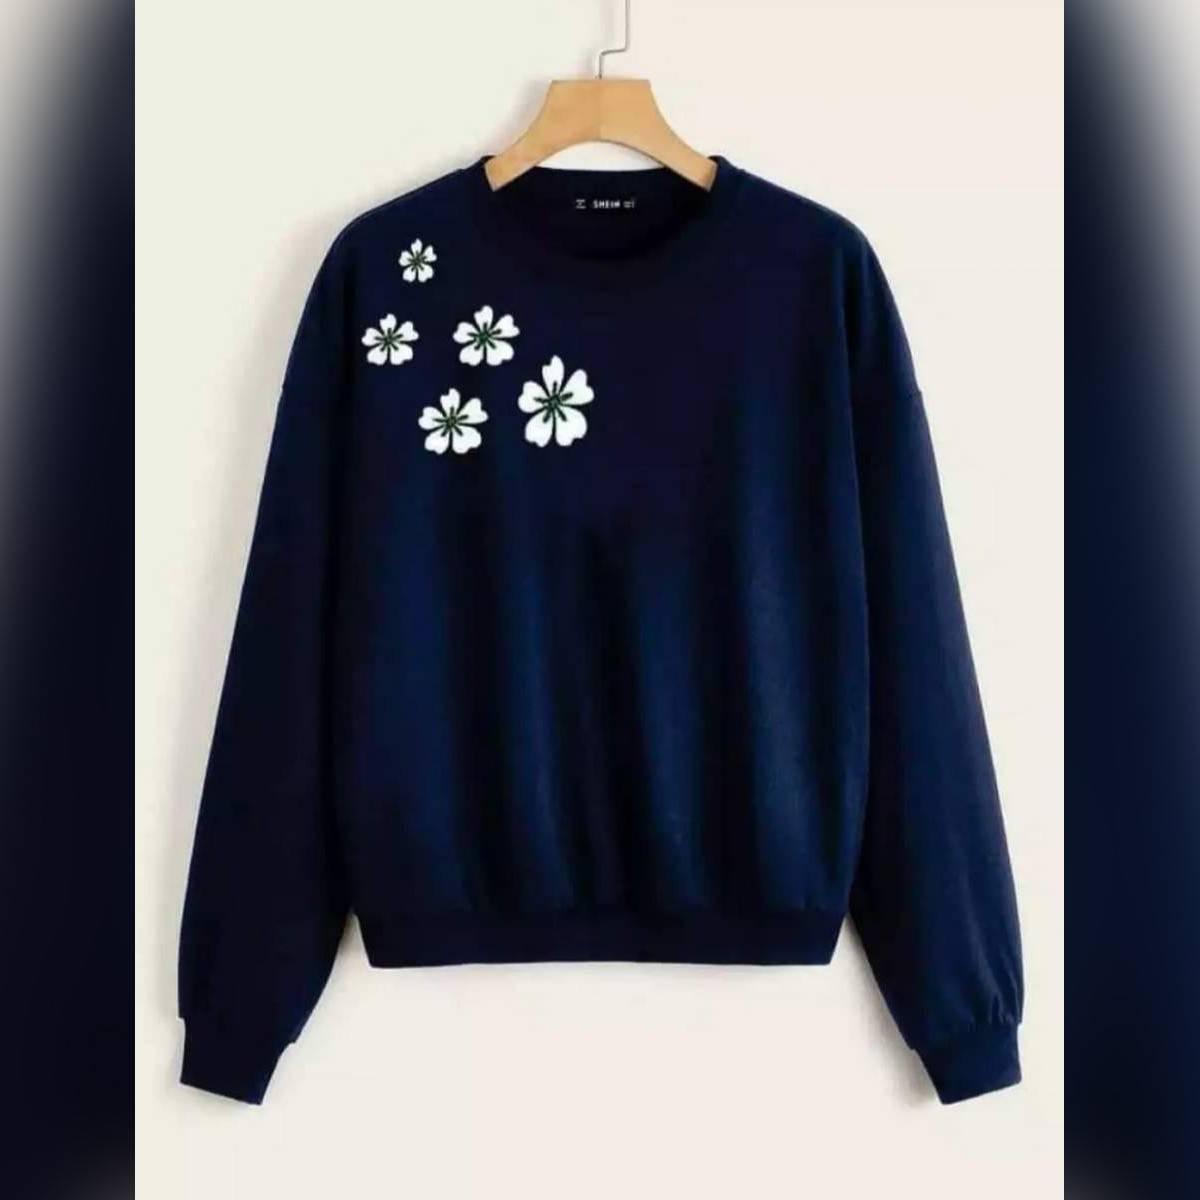 Navy Blue spring flowers printed sweat shirt